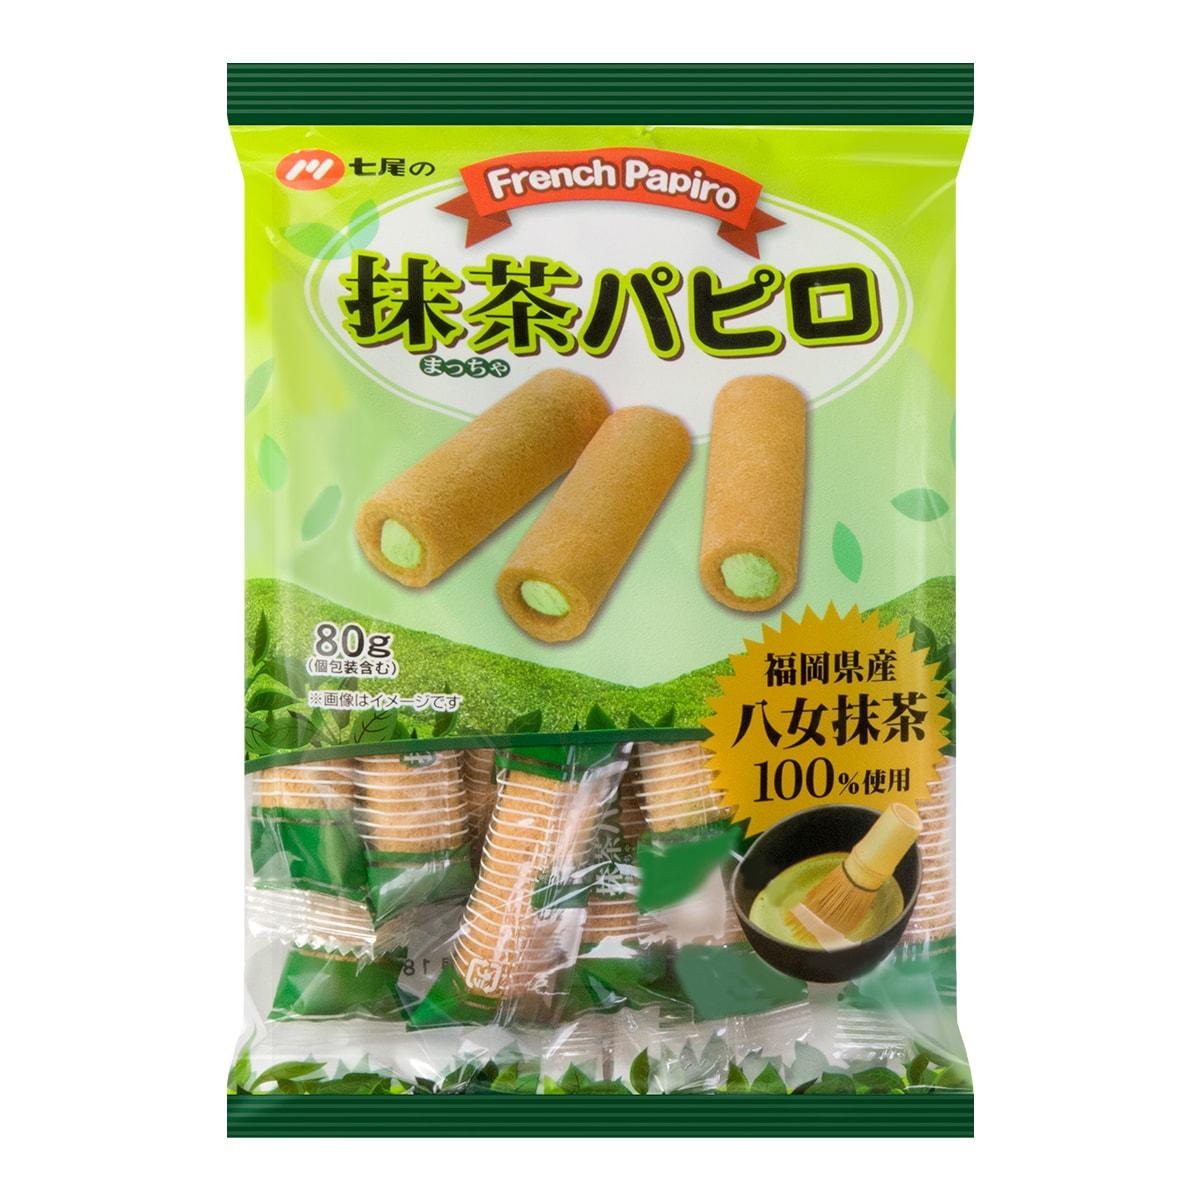 NANAO Matcha Cream Filling Roll 80g